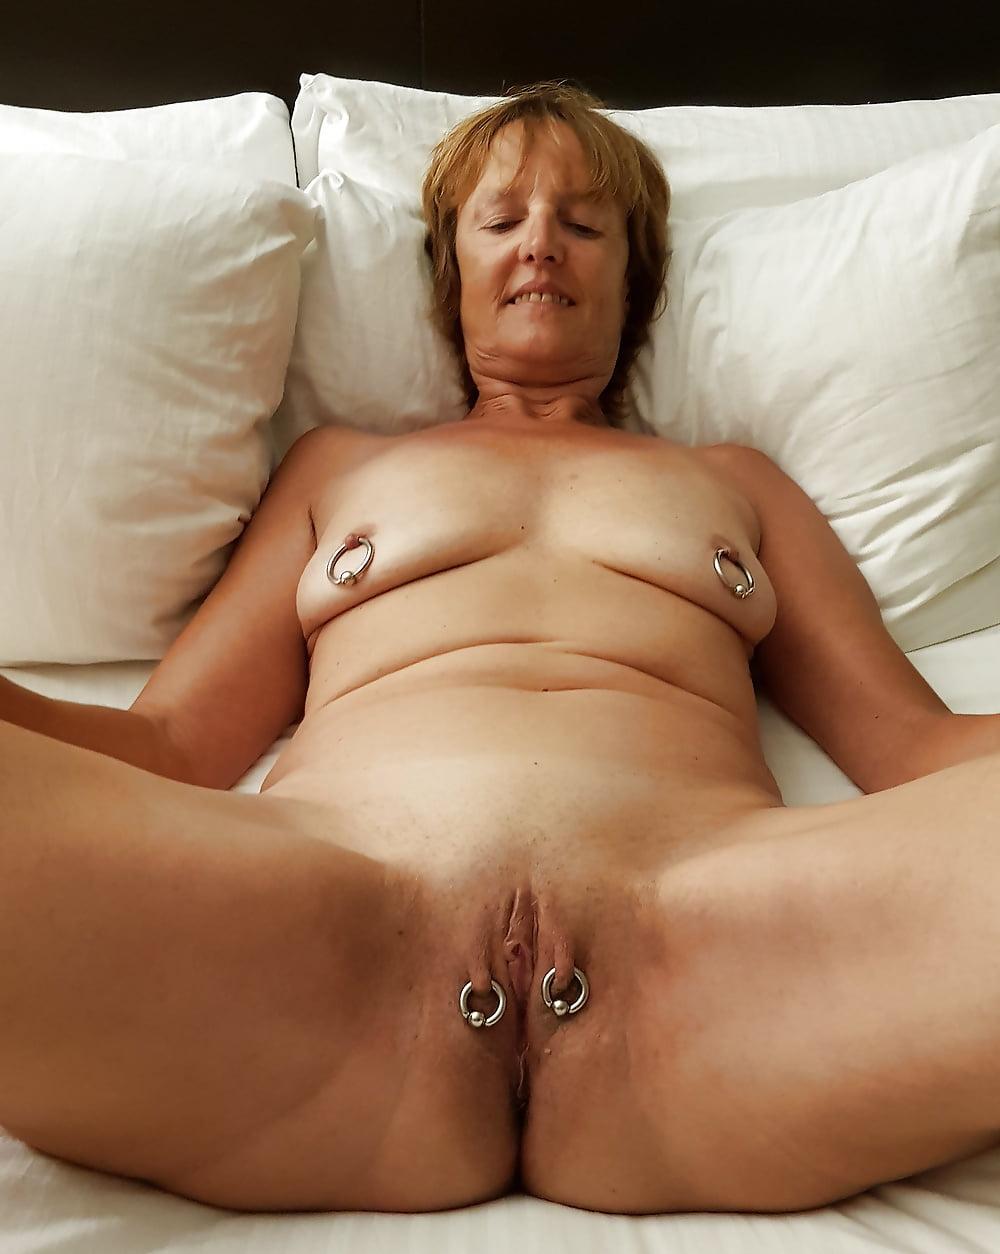 Fat women piercing pussy, nylon milf on big cock